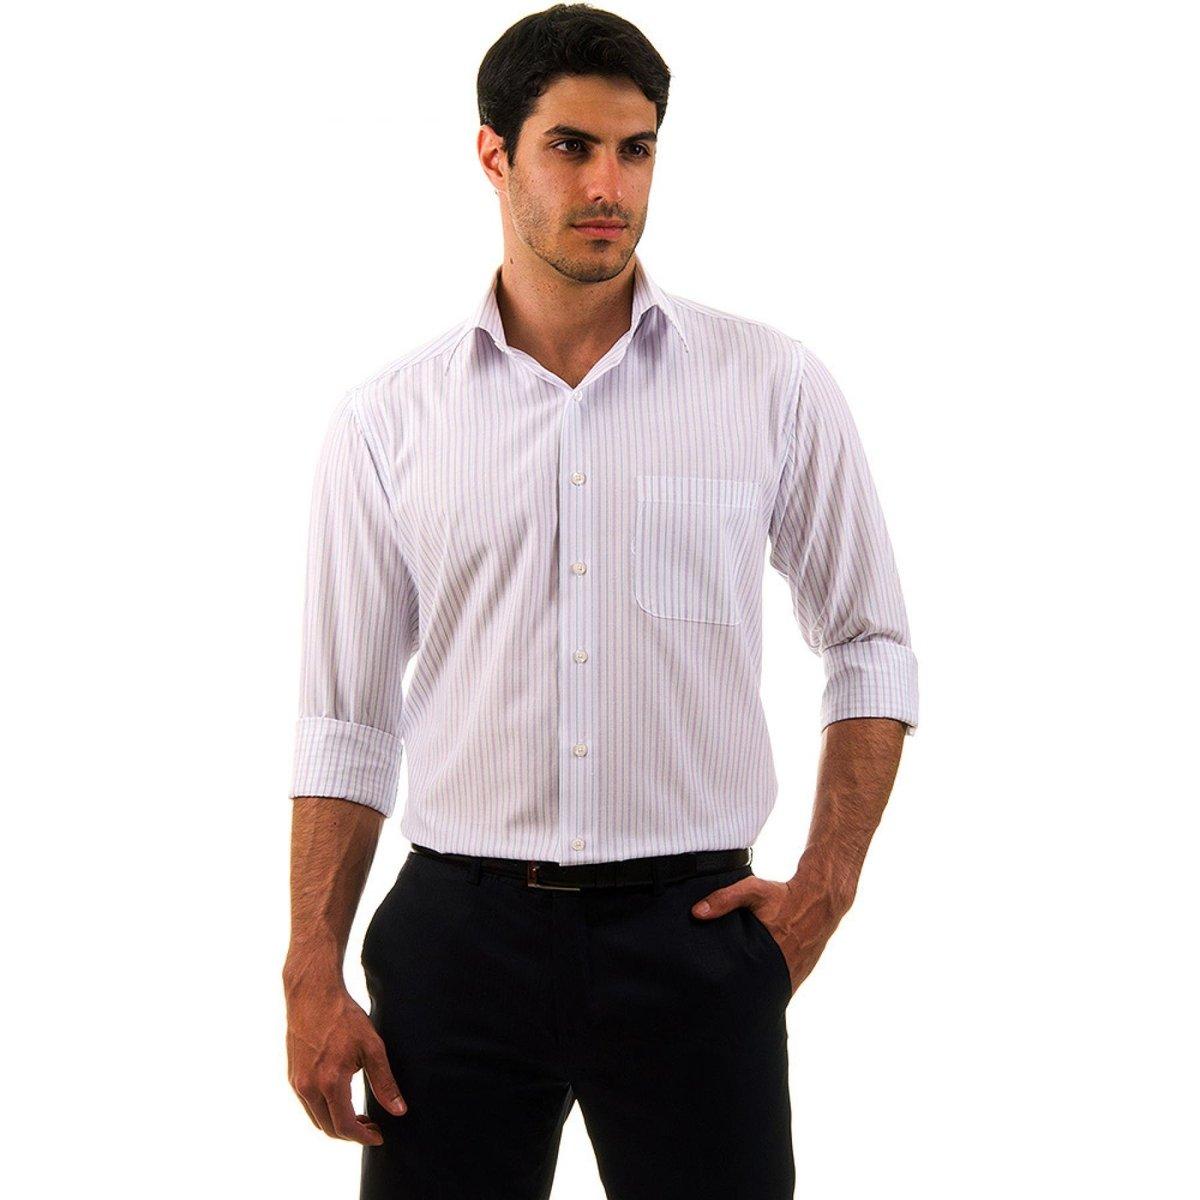 909bc01190 Camisa Social Listrada Colombo Masculino - Compre Agora